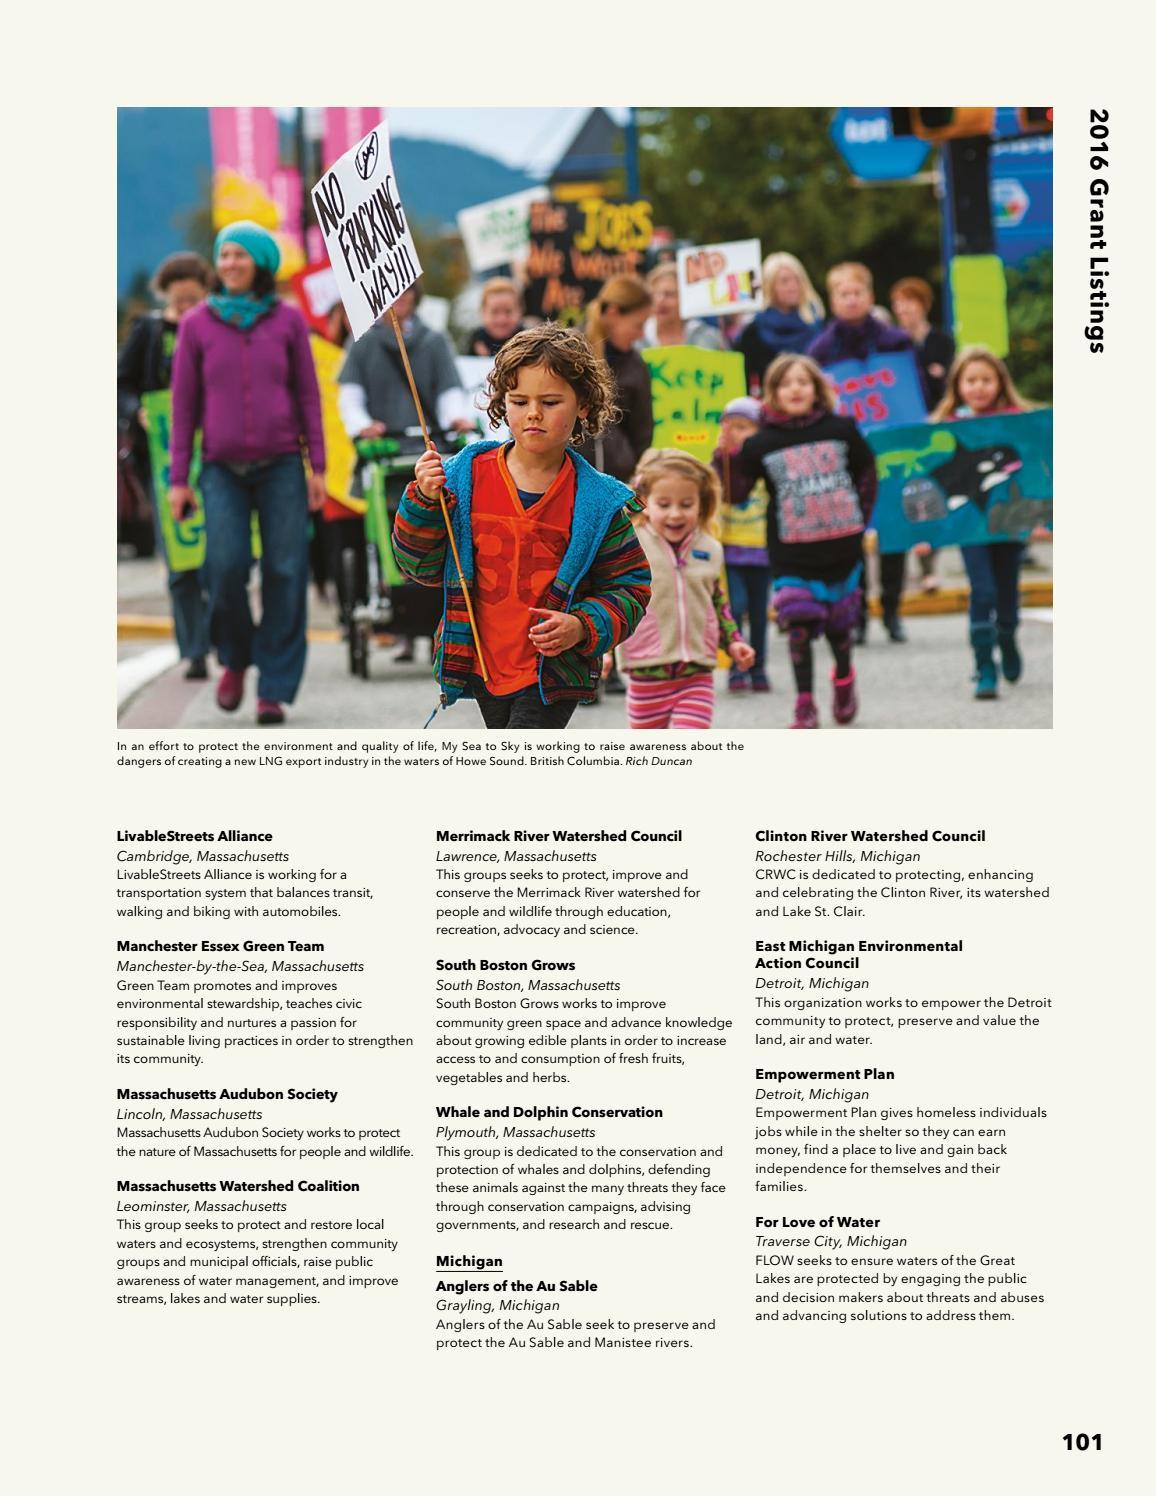 Patagonia Europe Environmental & Social Initiatives 2016 by